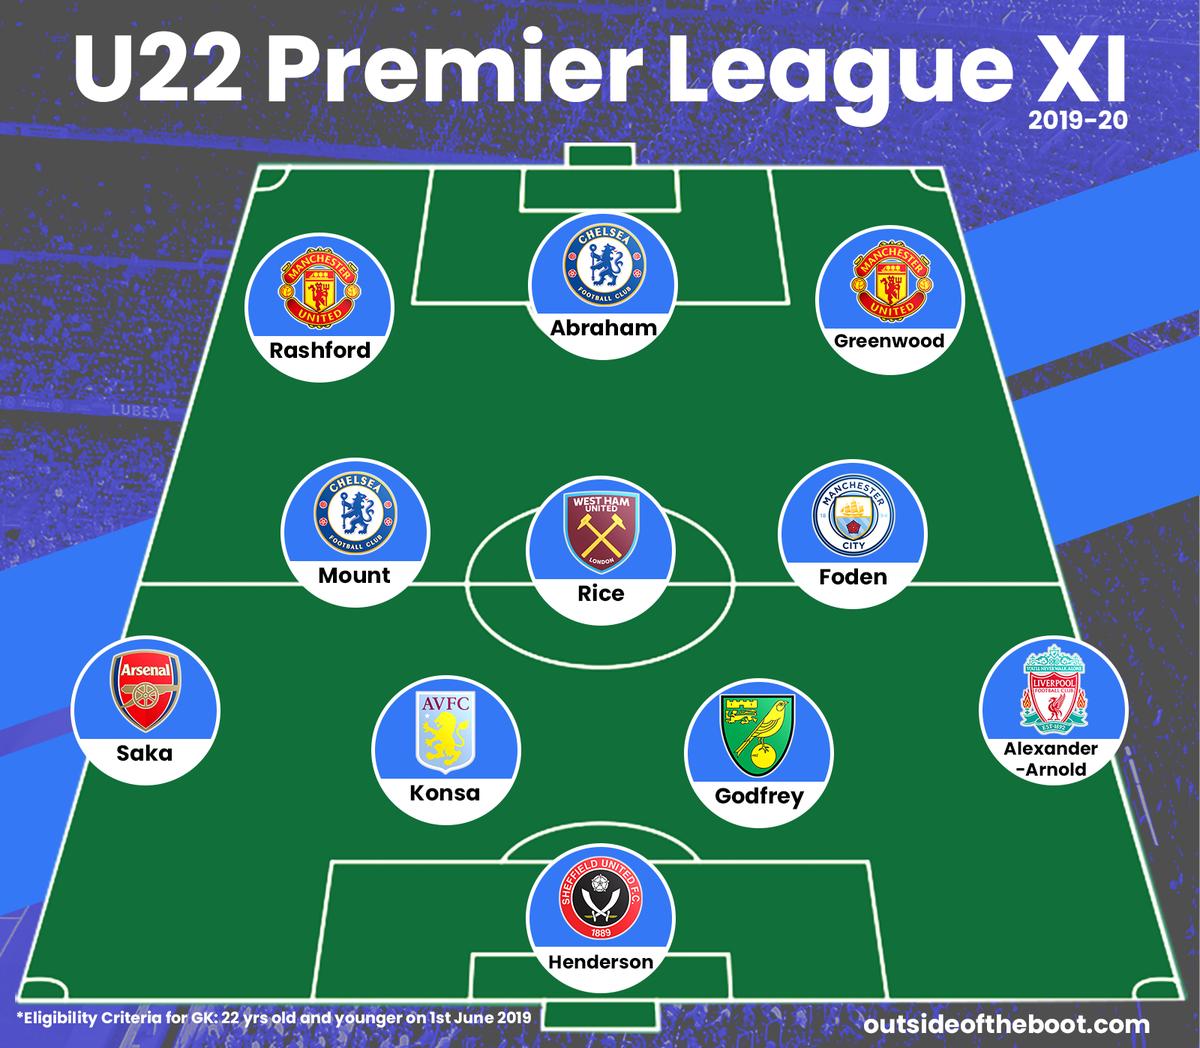 🏴 2019-20 Premier League U-22 Team of the Season  2⃣ x Chelsea 2⃣ x Man Utd 1⃣ x Arsenal 1⃣ x Aston Villa 1⃣ x Liverpool 1⃣ x Man City 1⃣ x Norwich 1⃣ x Sheffield Utd 1⃣ x West Ham  🔗: https://t.co/wrlqPwc01m https://t.co/MrL1vKwMFo